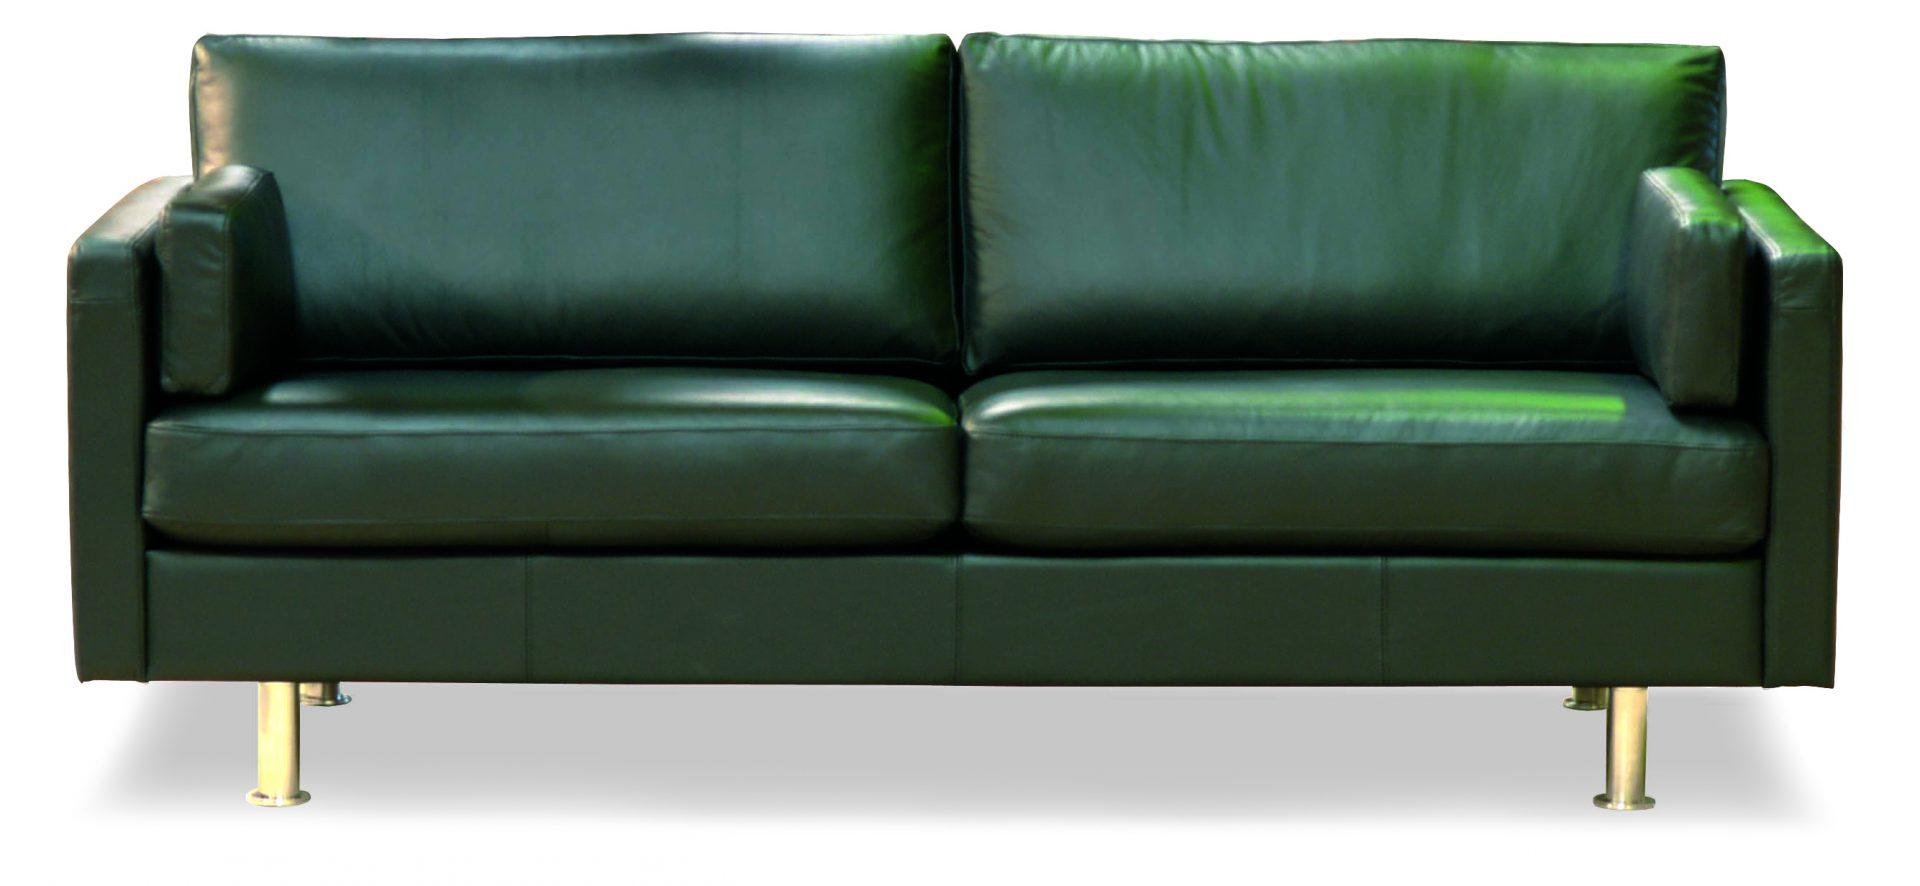 Hammilton 2 sofa